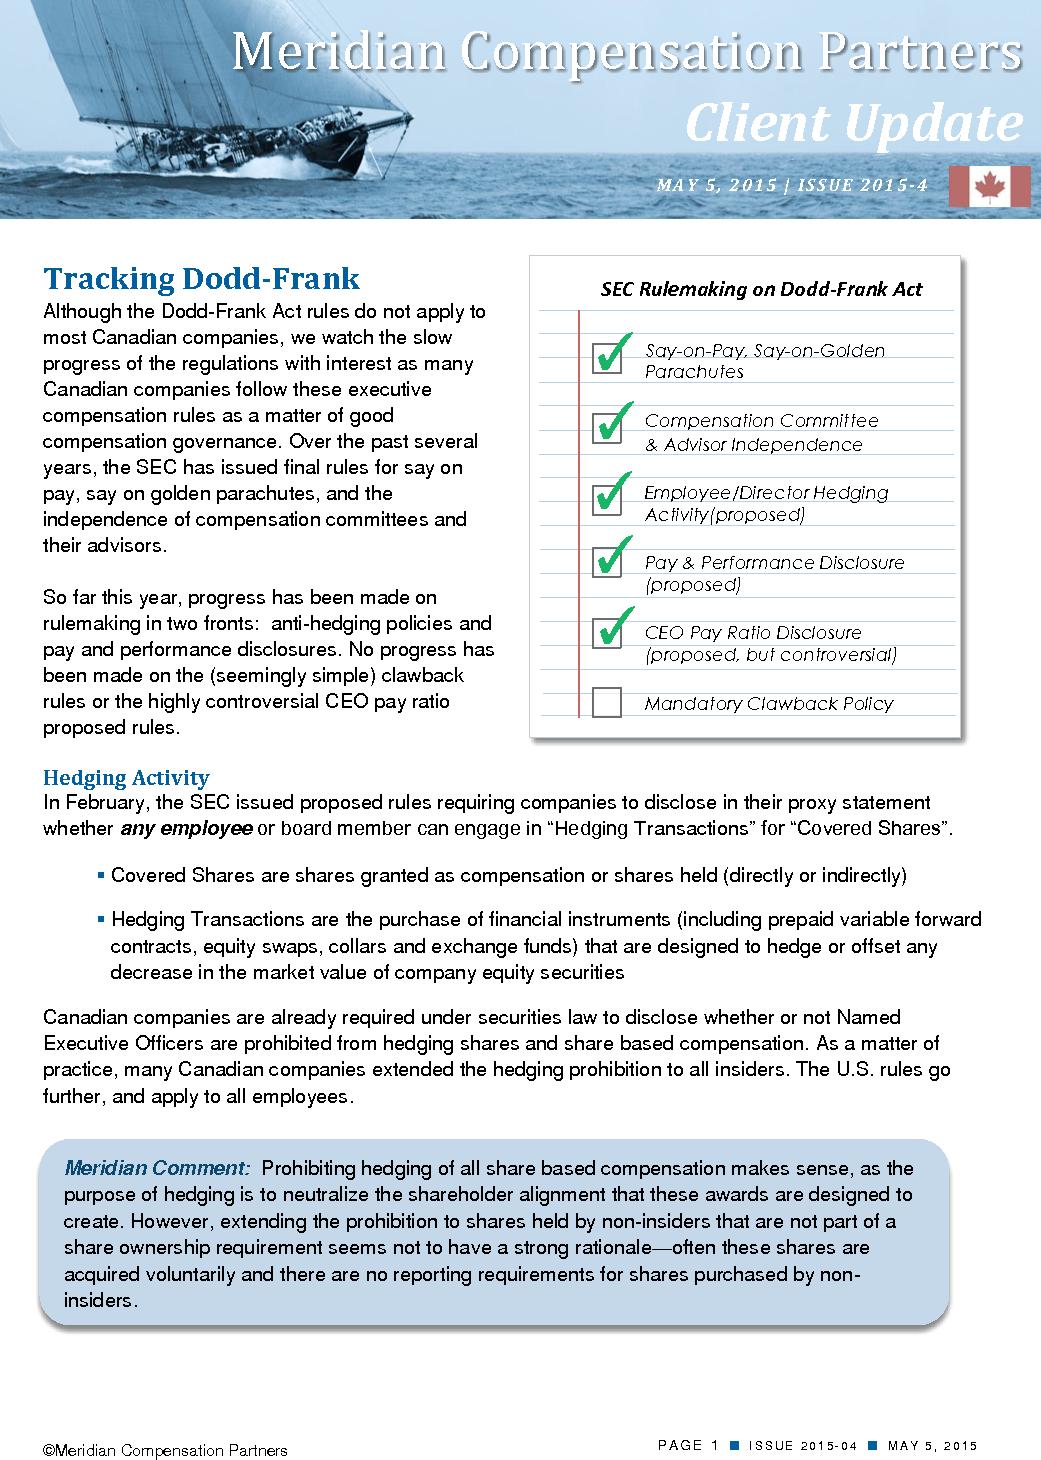 Tracking Dodd-Frank (PDF)